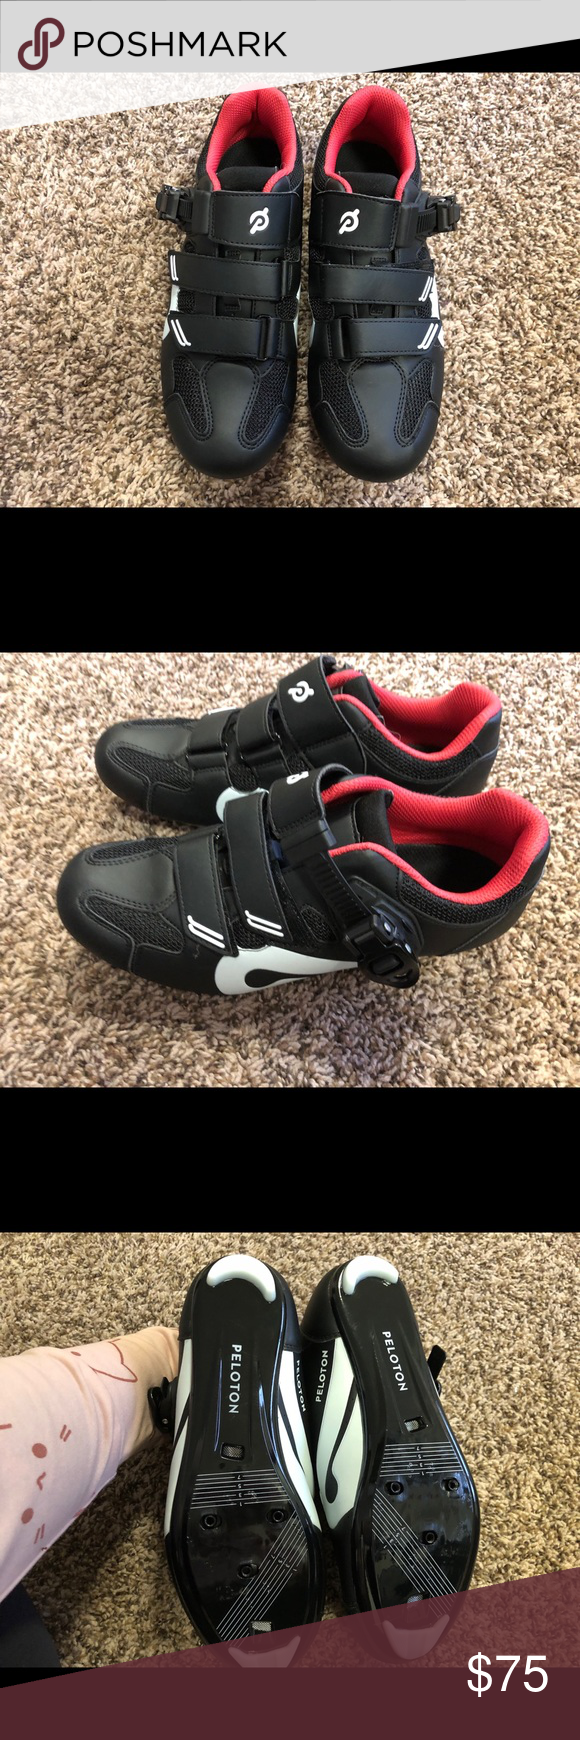 Peloton cycling shoes | Cycling shoes